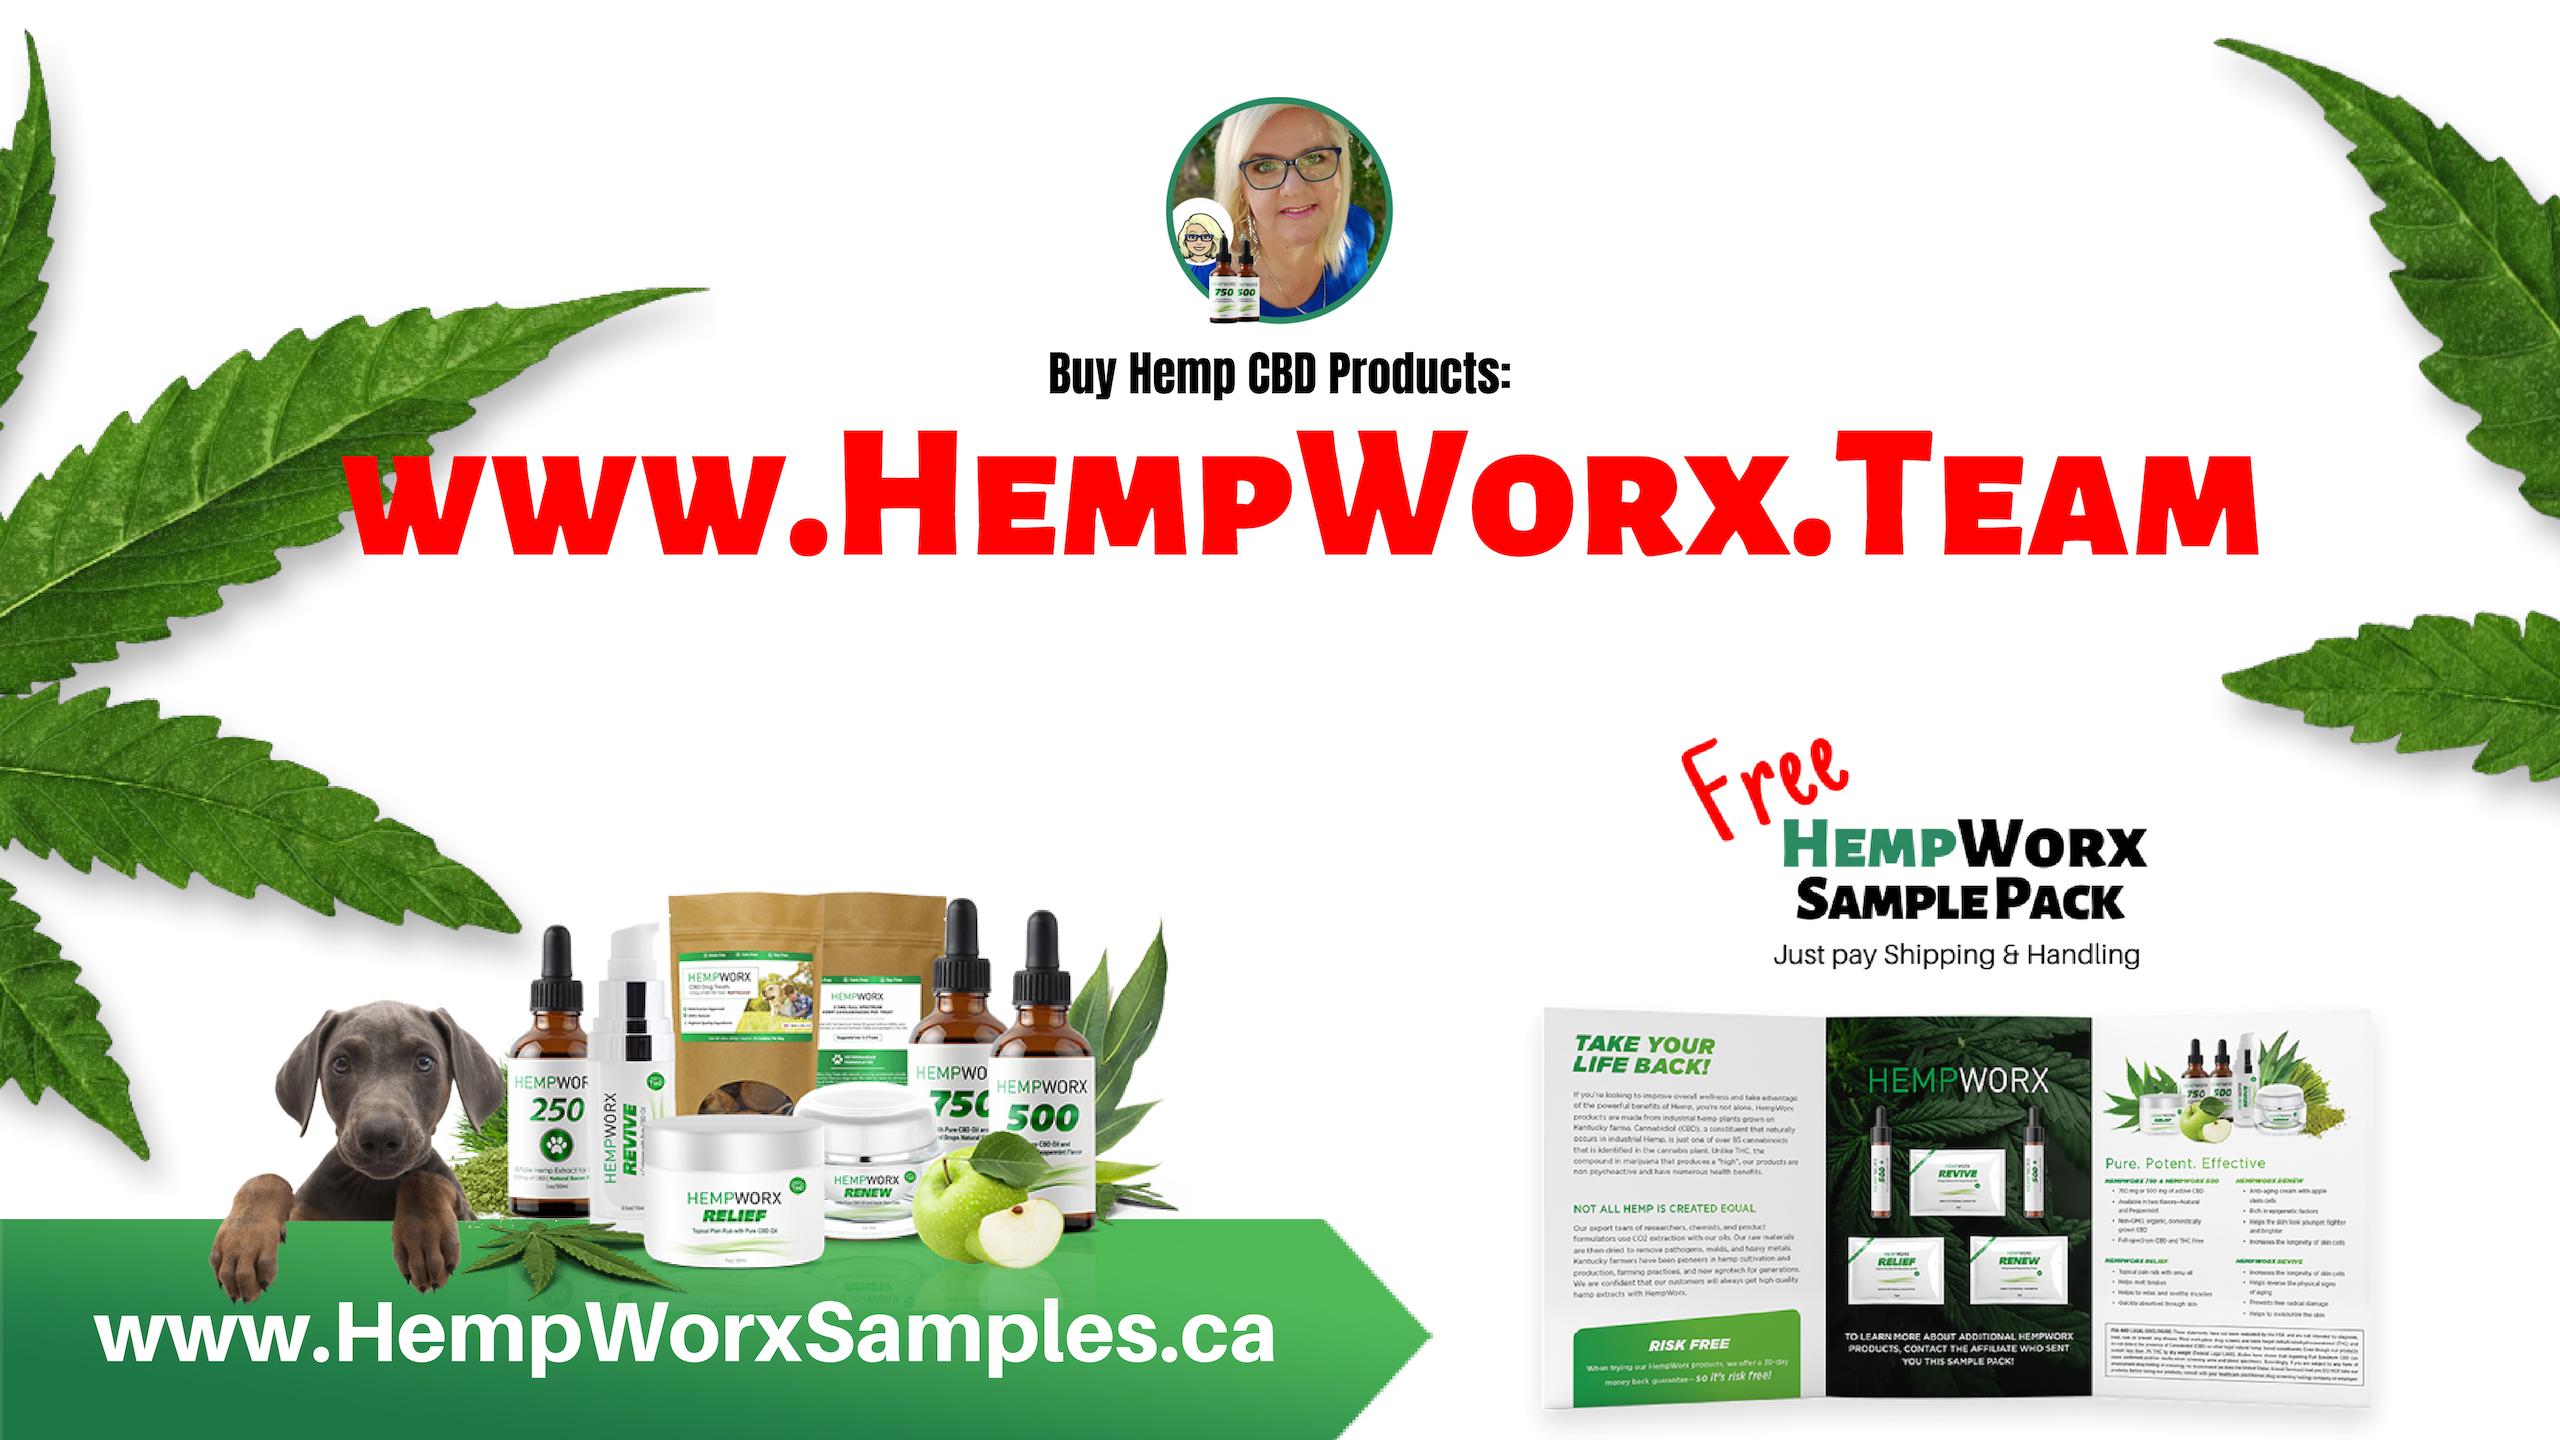 www.HempWorxSamples.ca